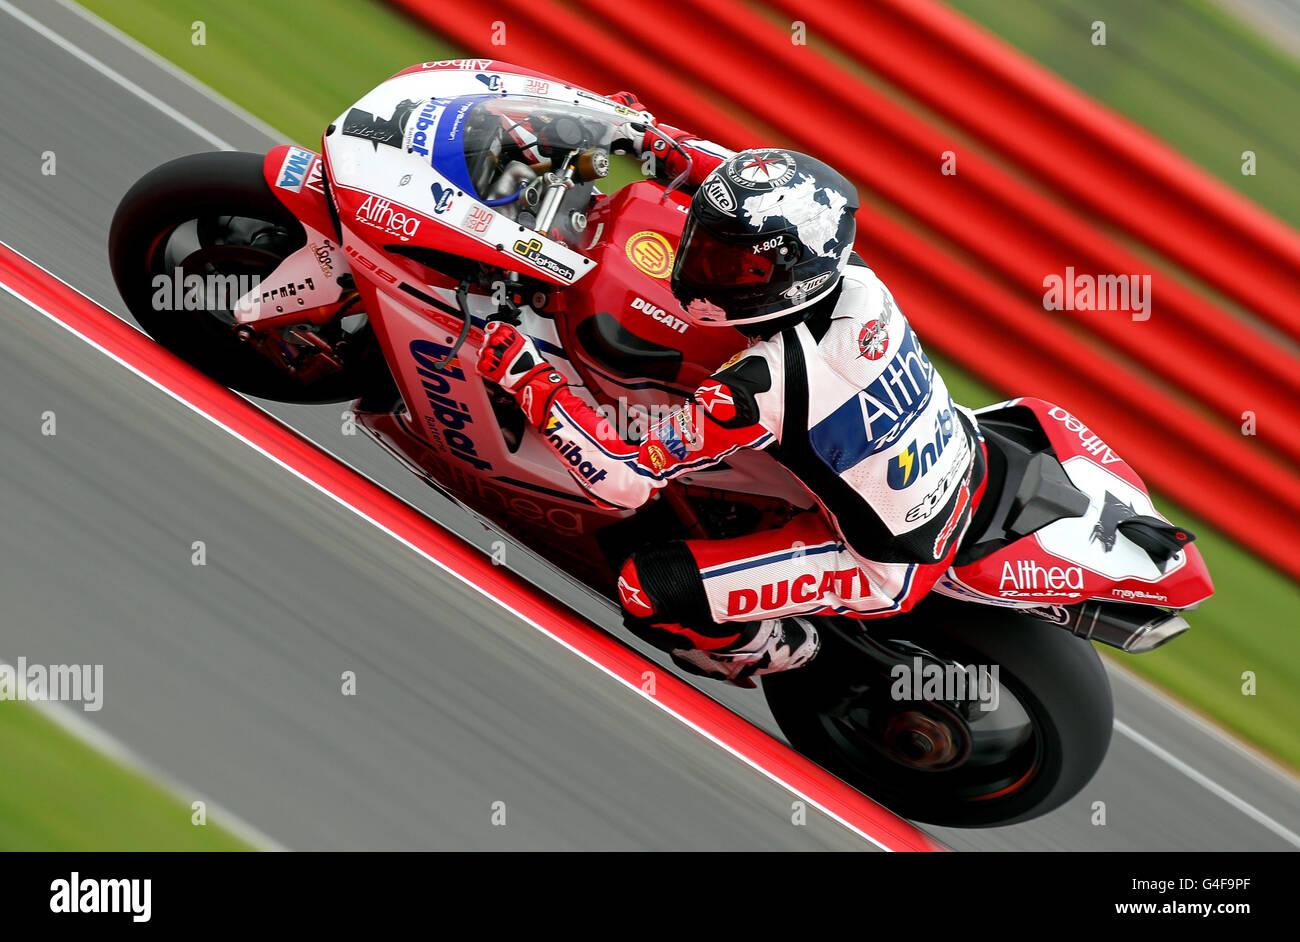 Carlos Checa Superbike World ChampionshipStock Photos and Images